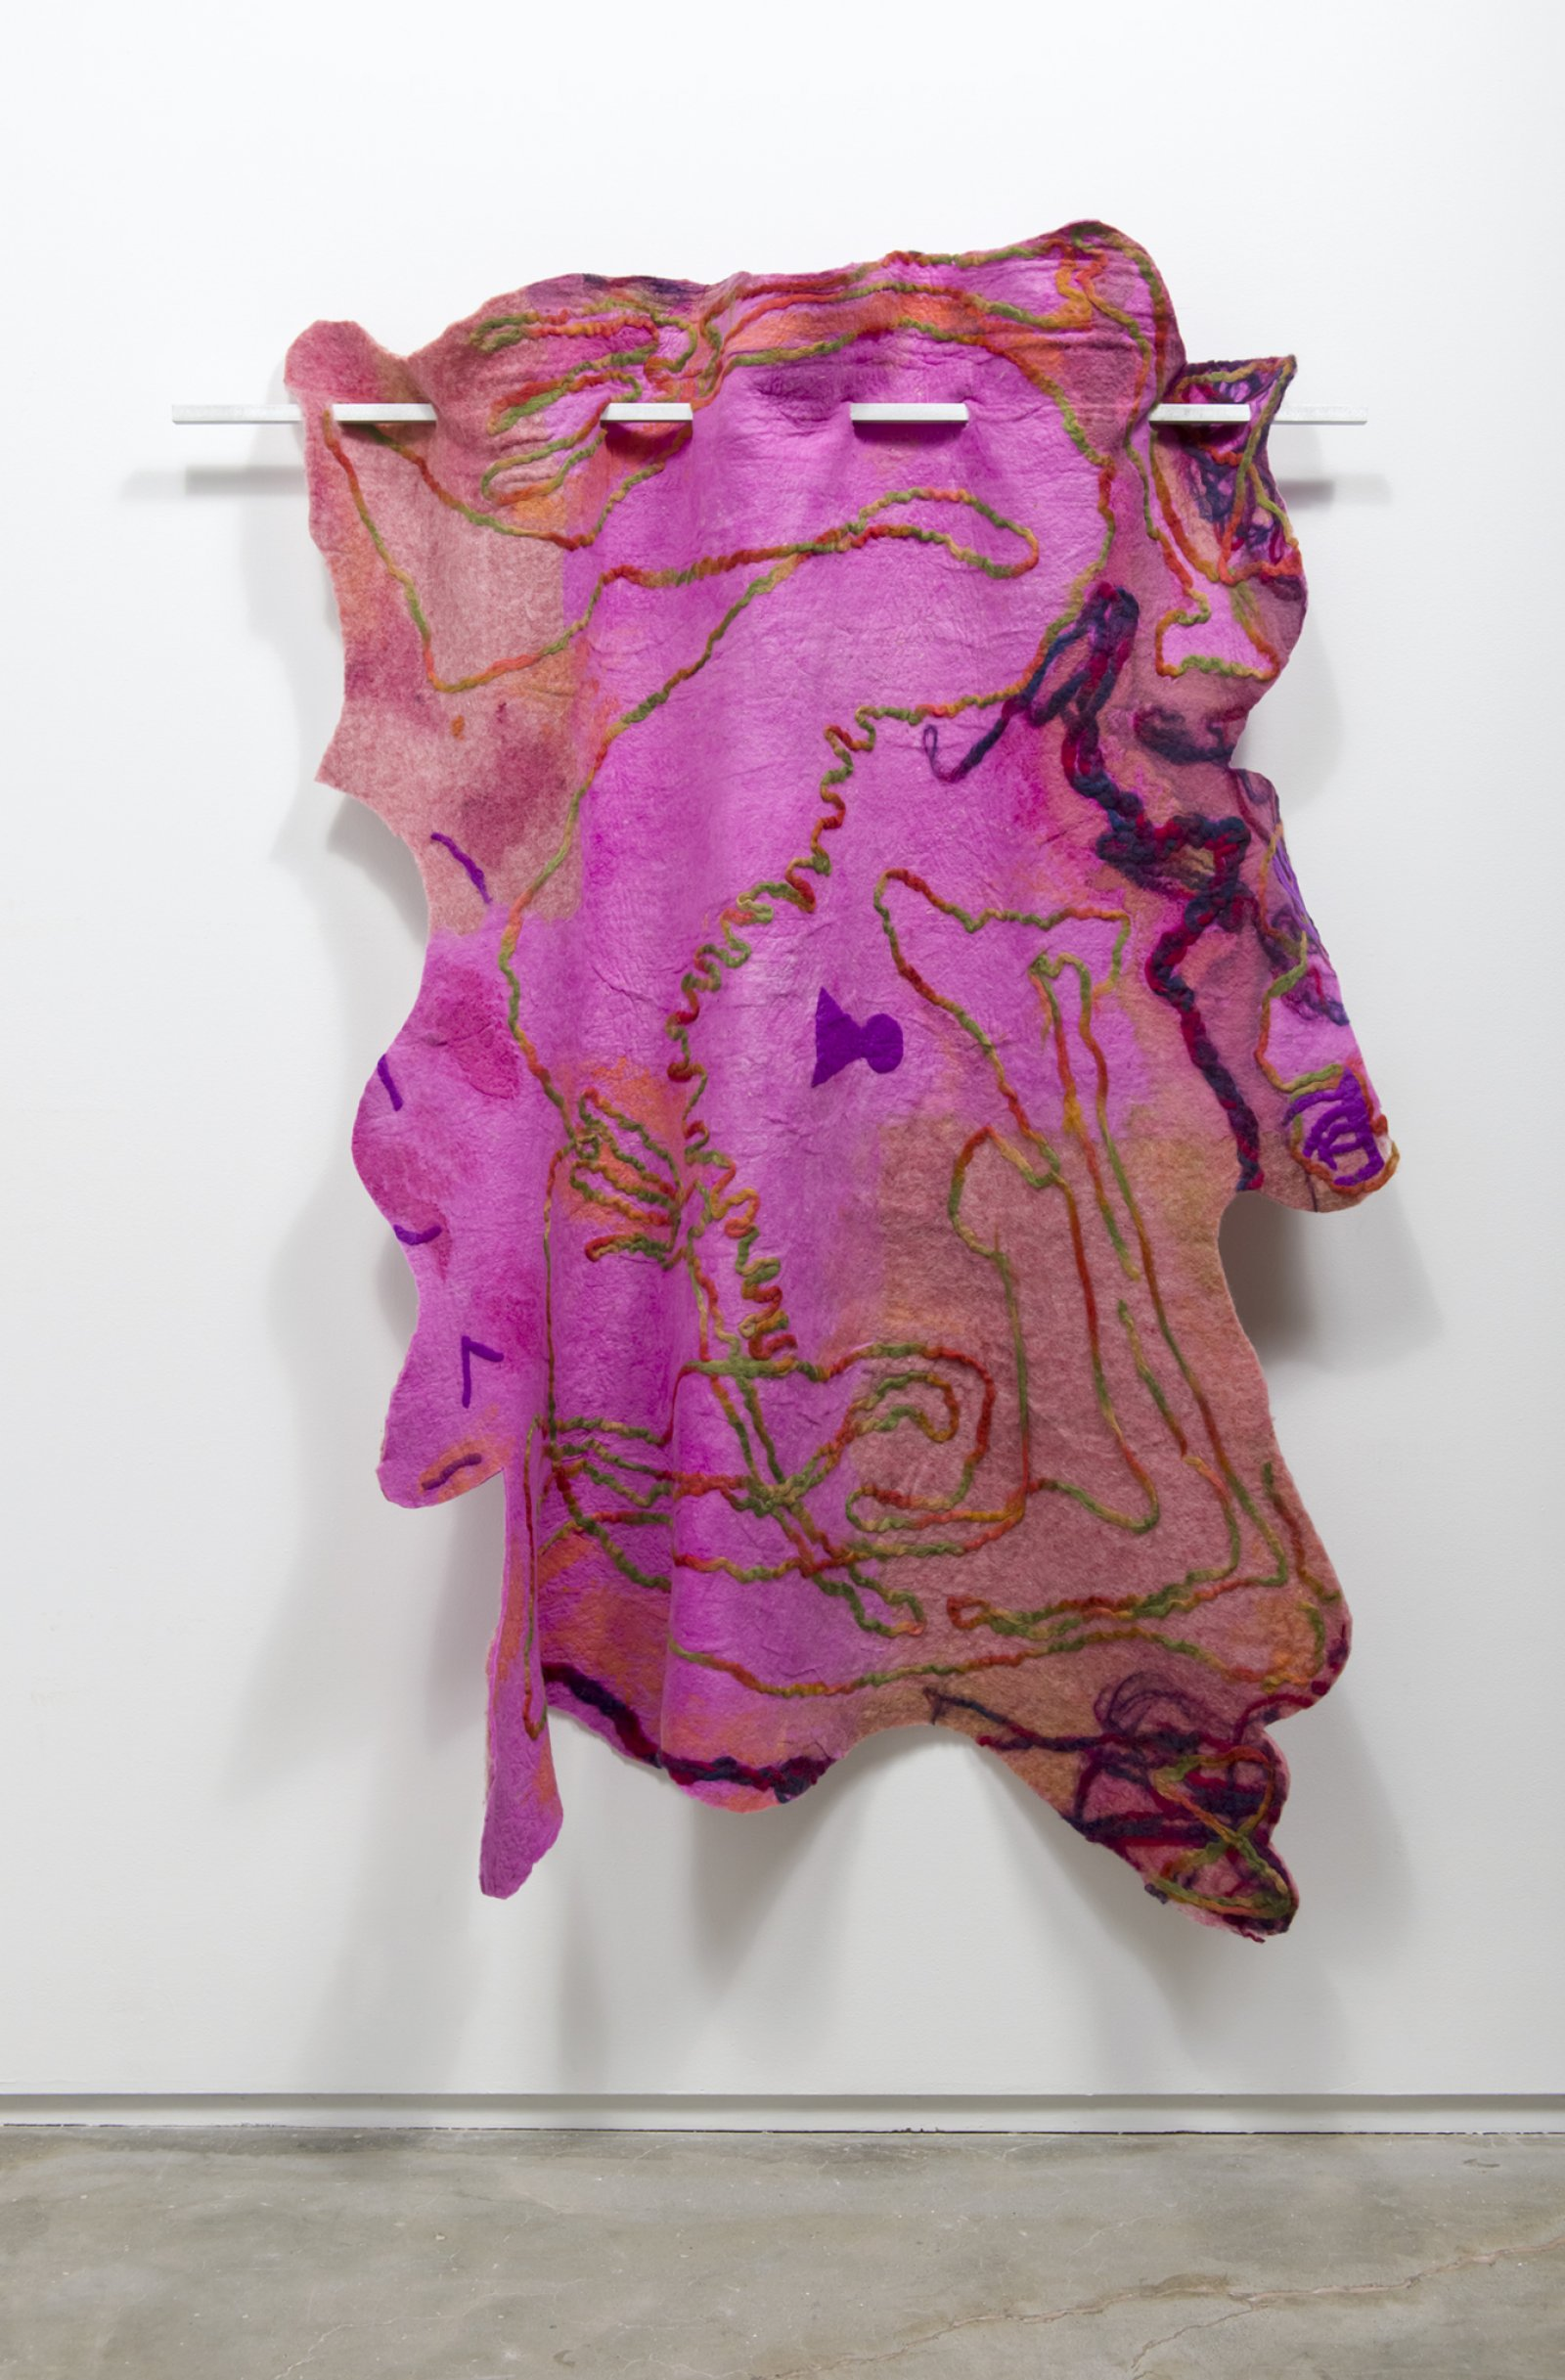 Rebecca Brewer,Bellmer, 2016, wool felt, metal, 77 x 55 in. (196 x 140 cm)